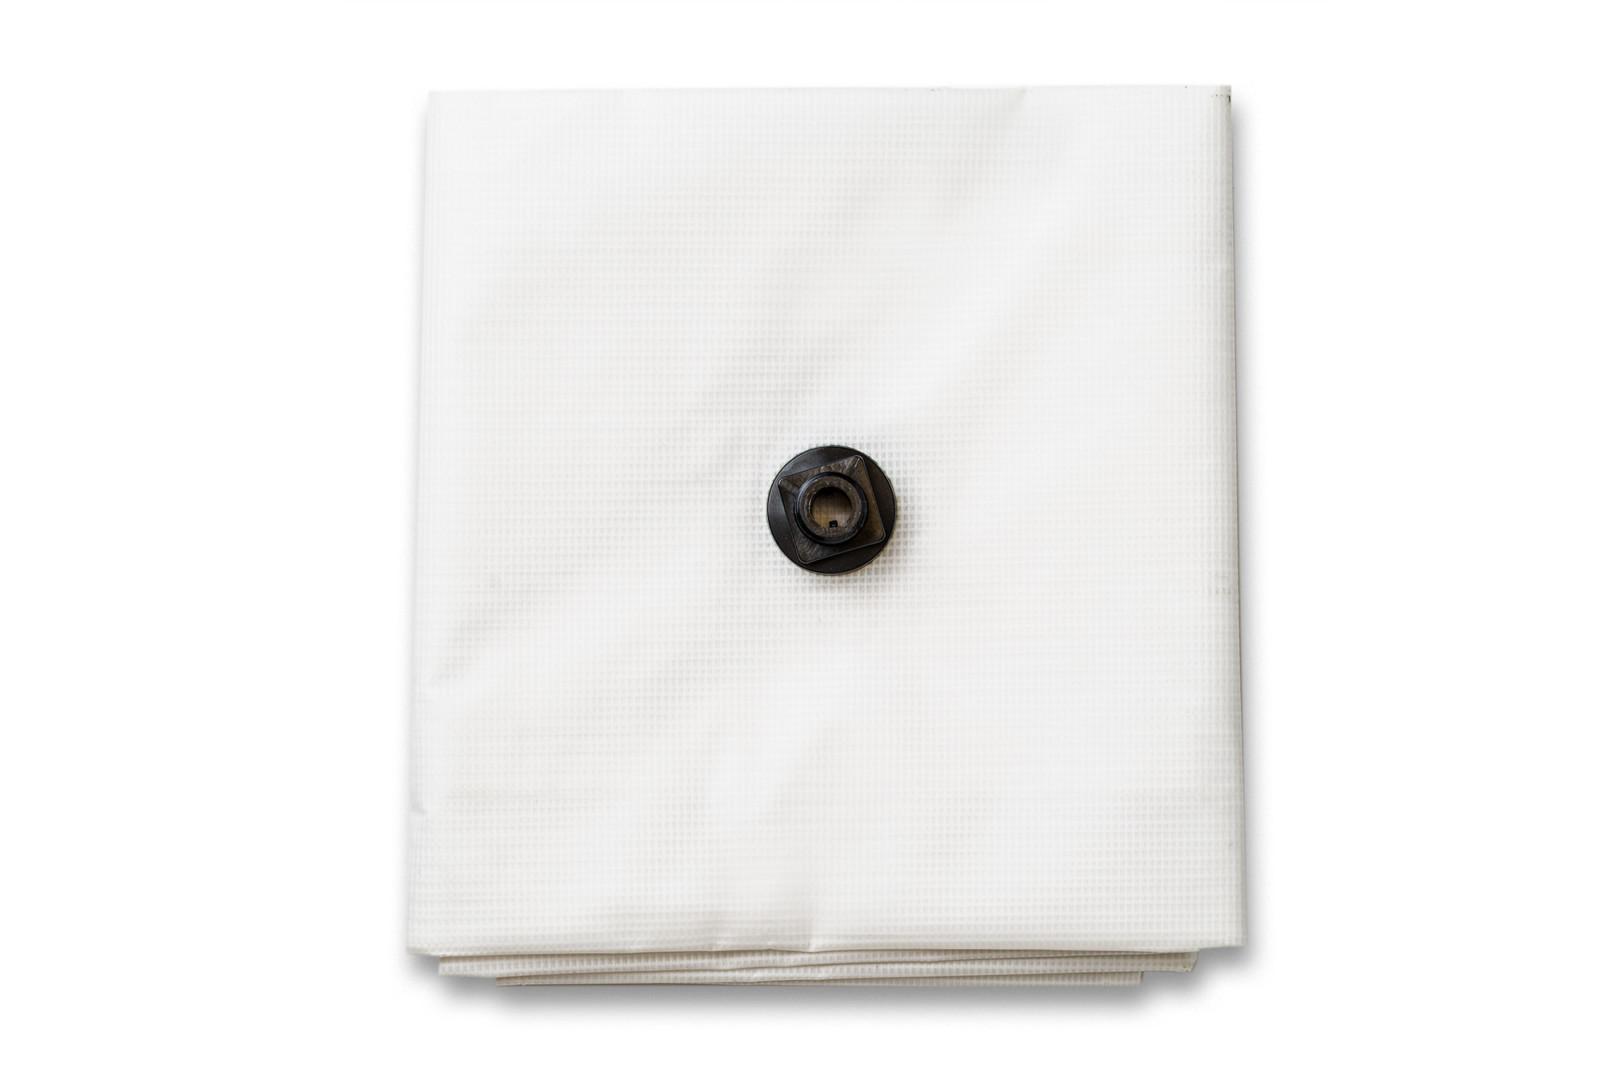 18 oz Canvas Tarps - Water Resistant - Heavy Duty & Durable